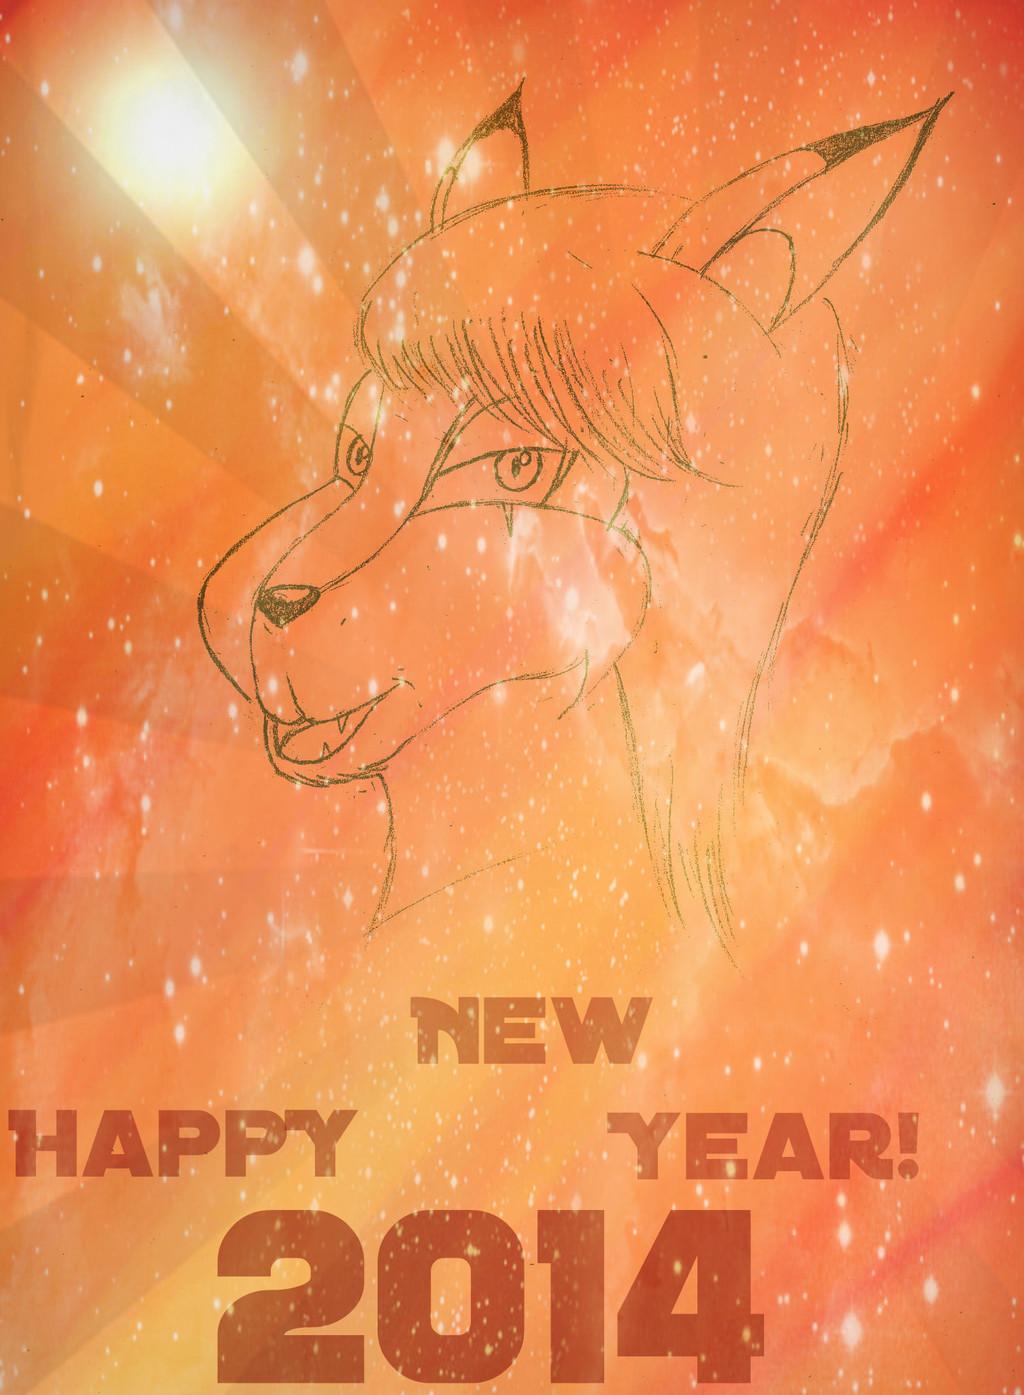 Reborn in 2014 (Happy New Year!)